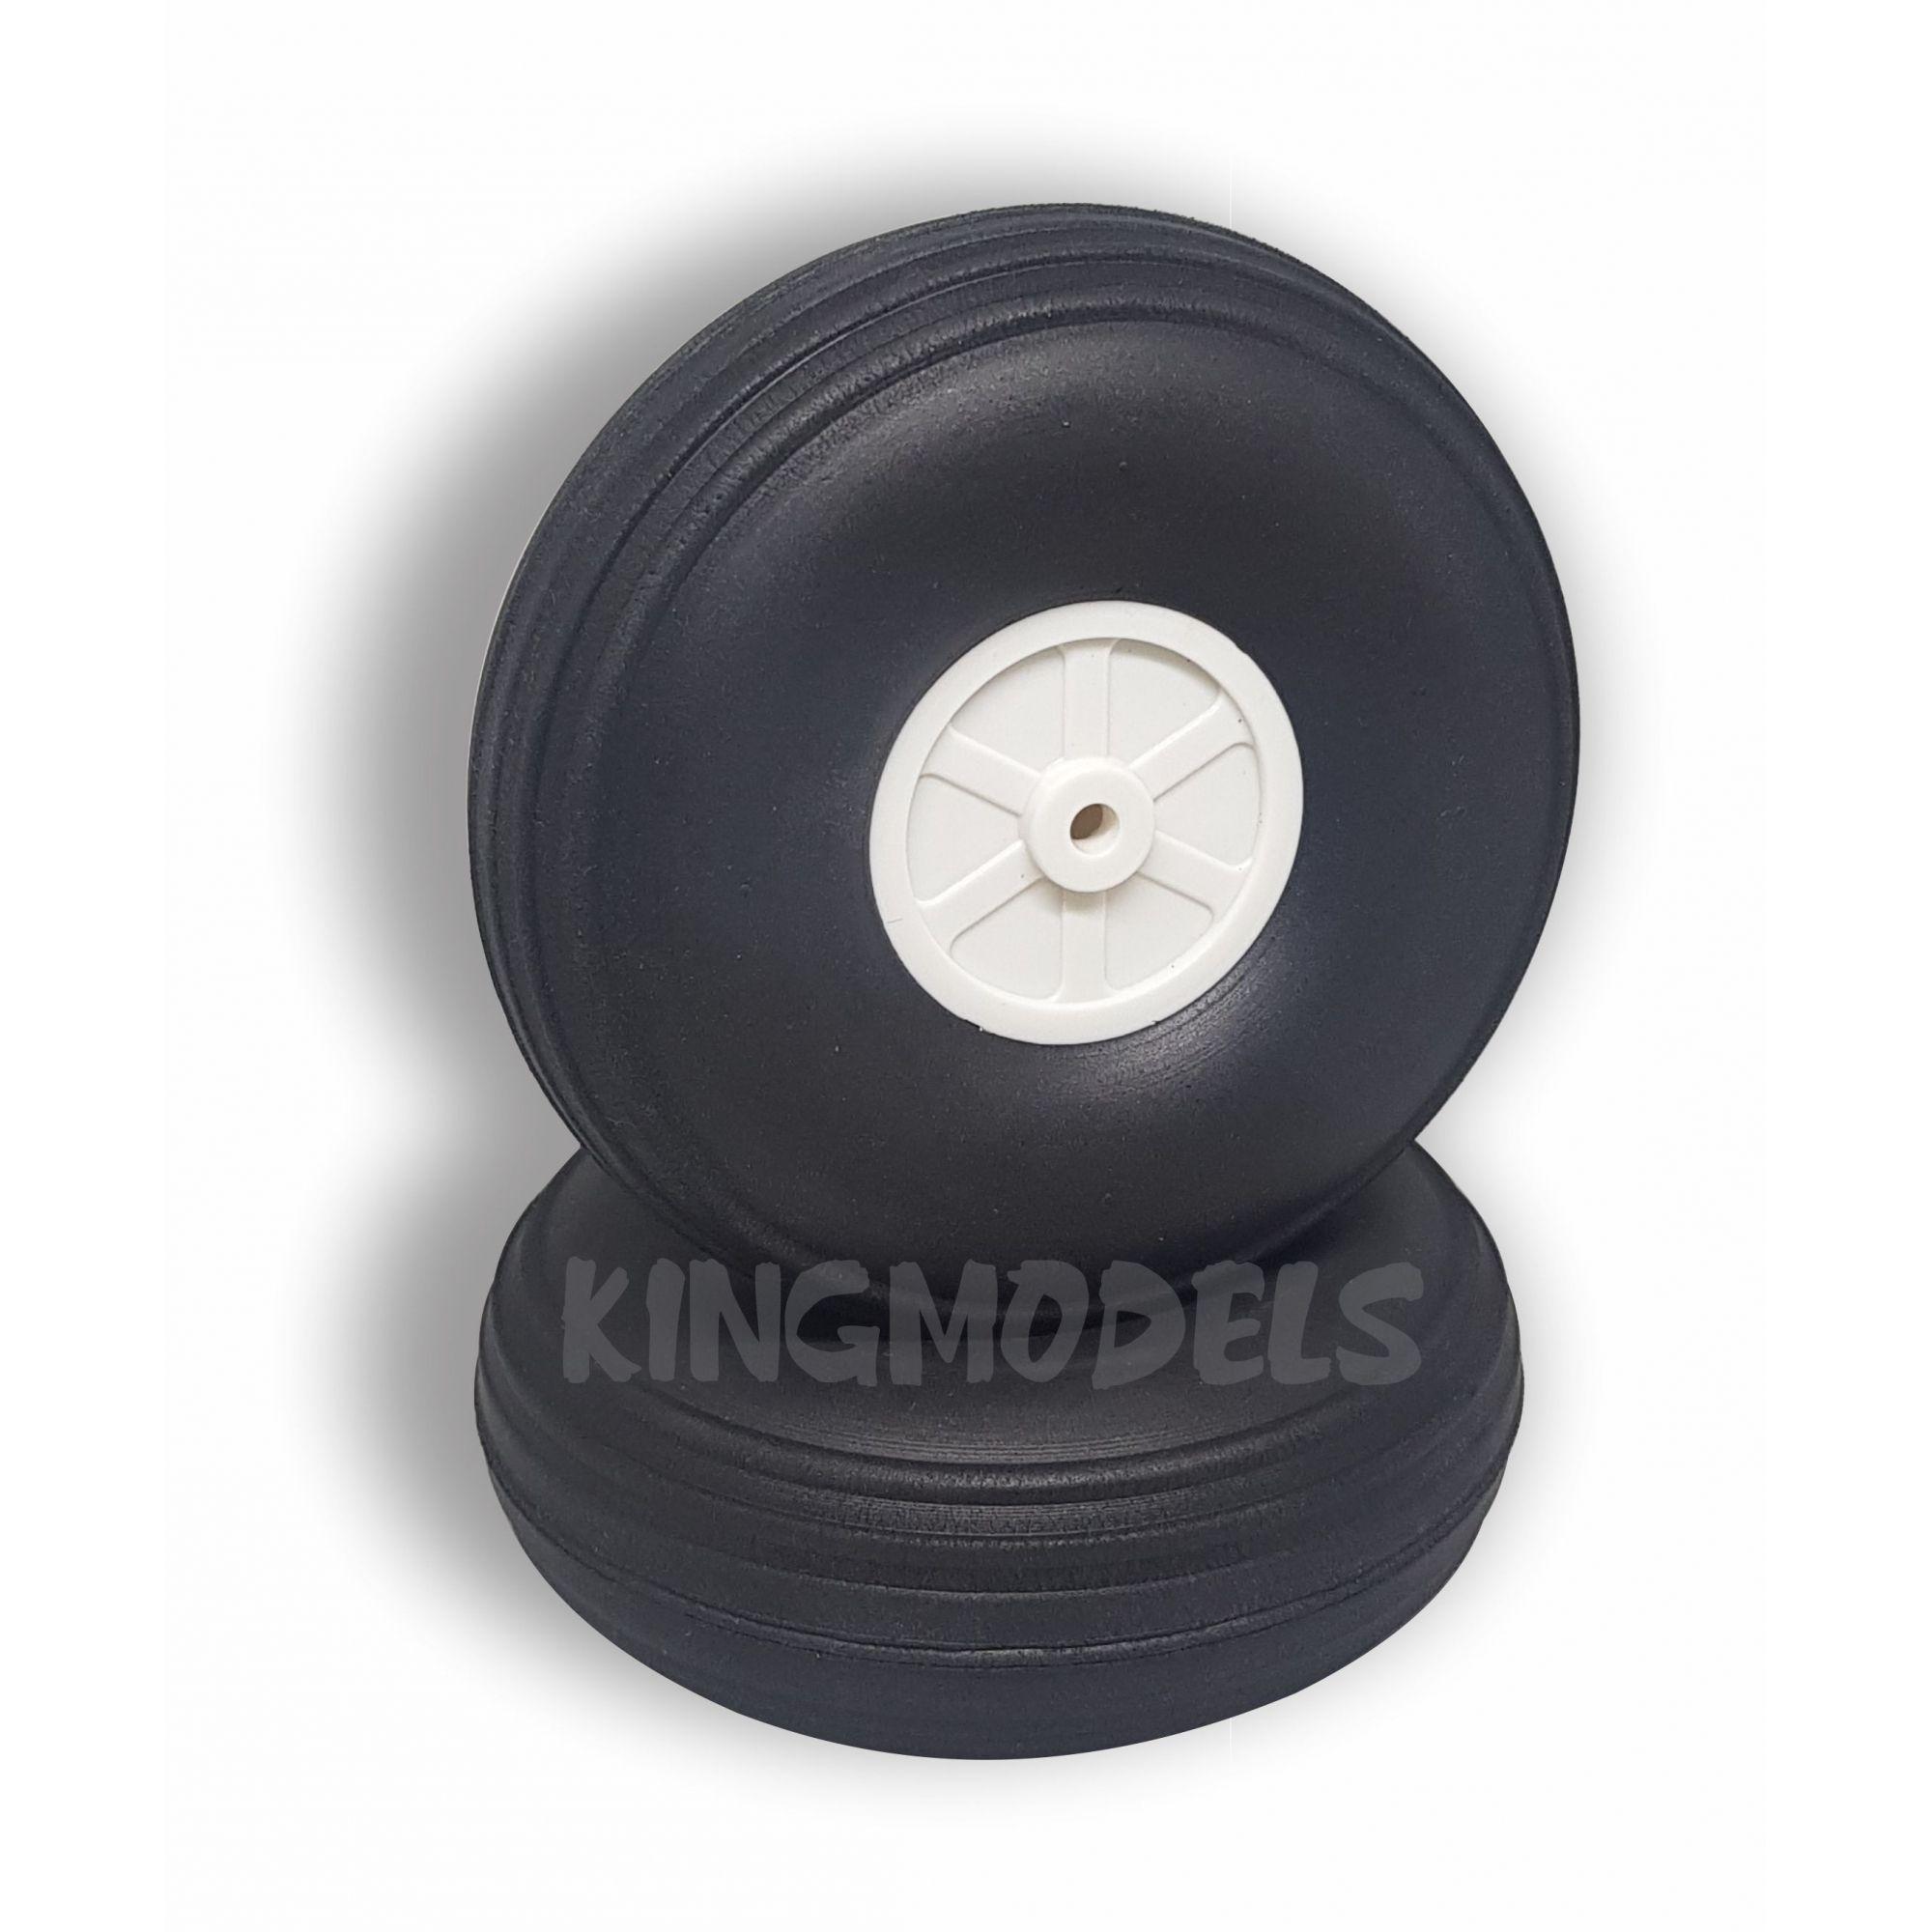 Roda De Borracha Extra-leve E Cubo Nylon-114mm - Unidade  - King Models